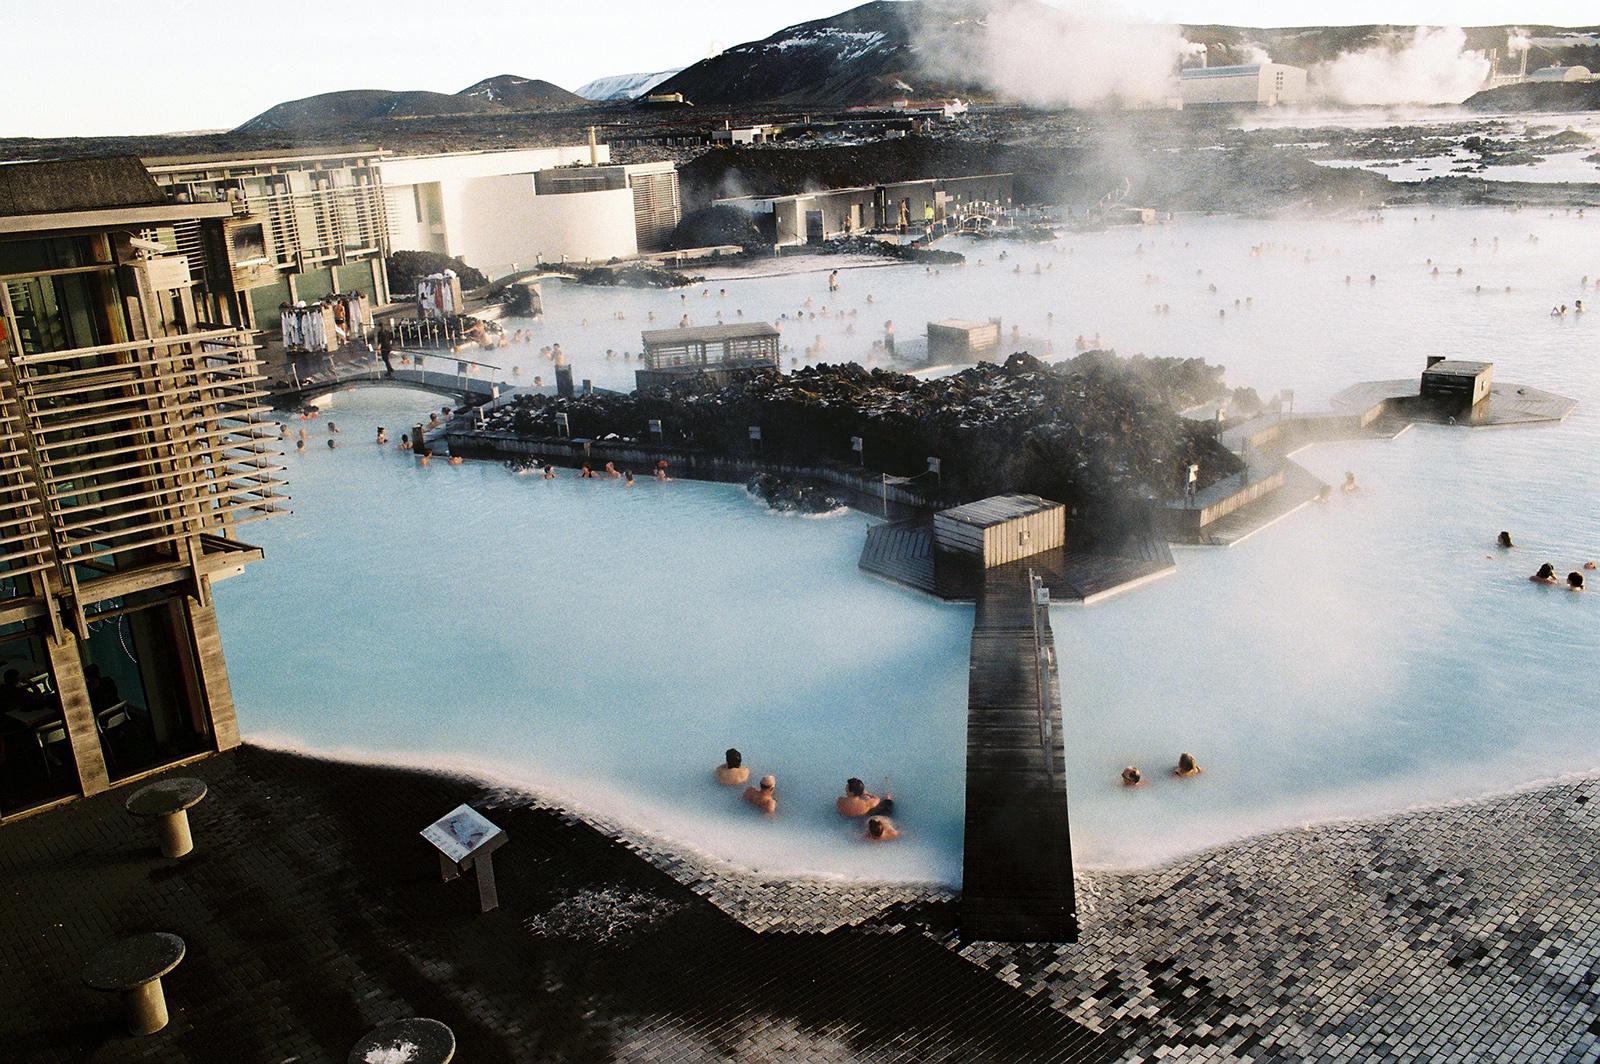 Blue Lagoon Geothermal Spa, Iceland 2014